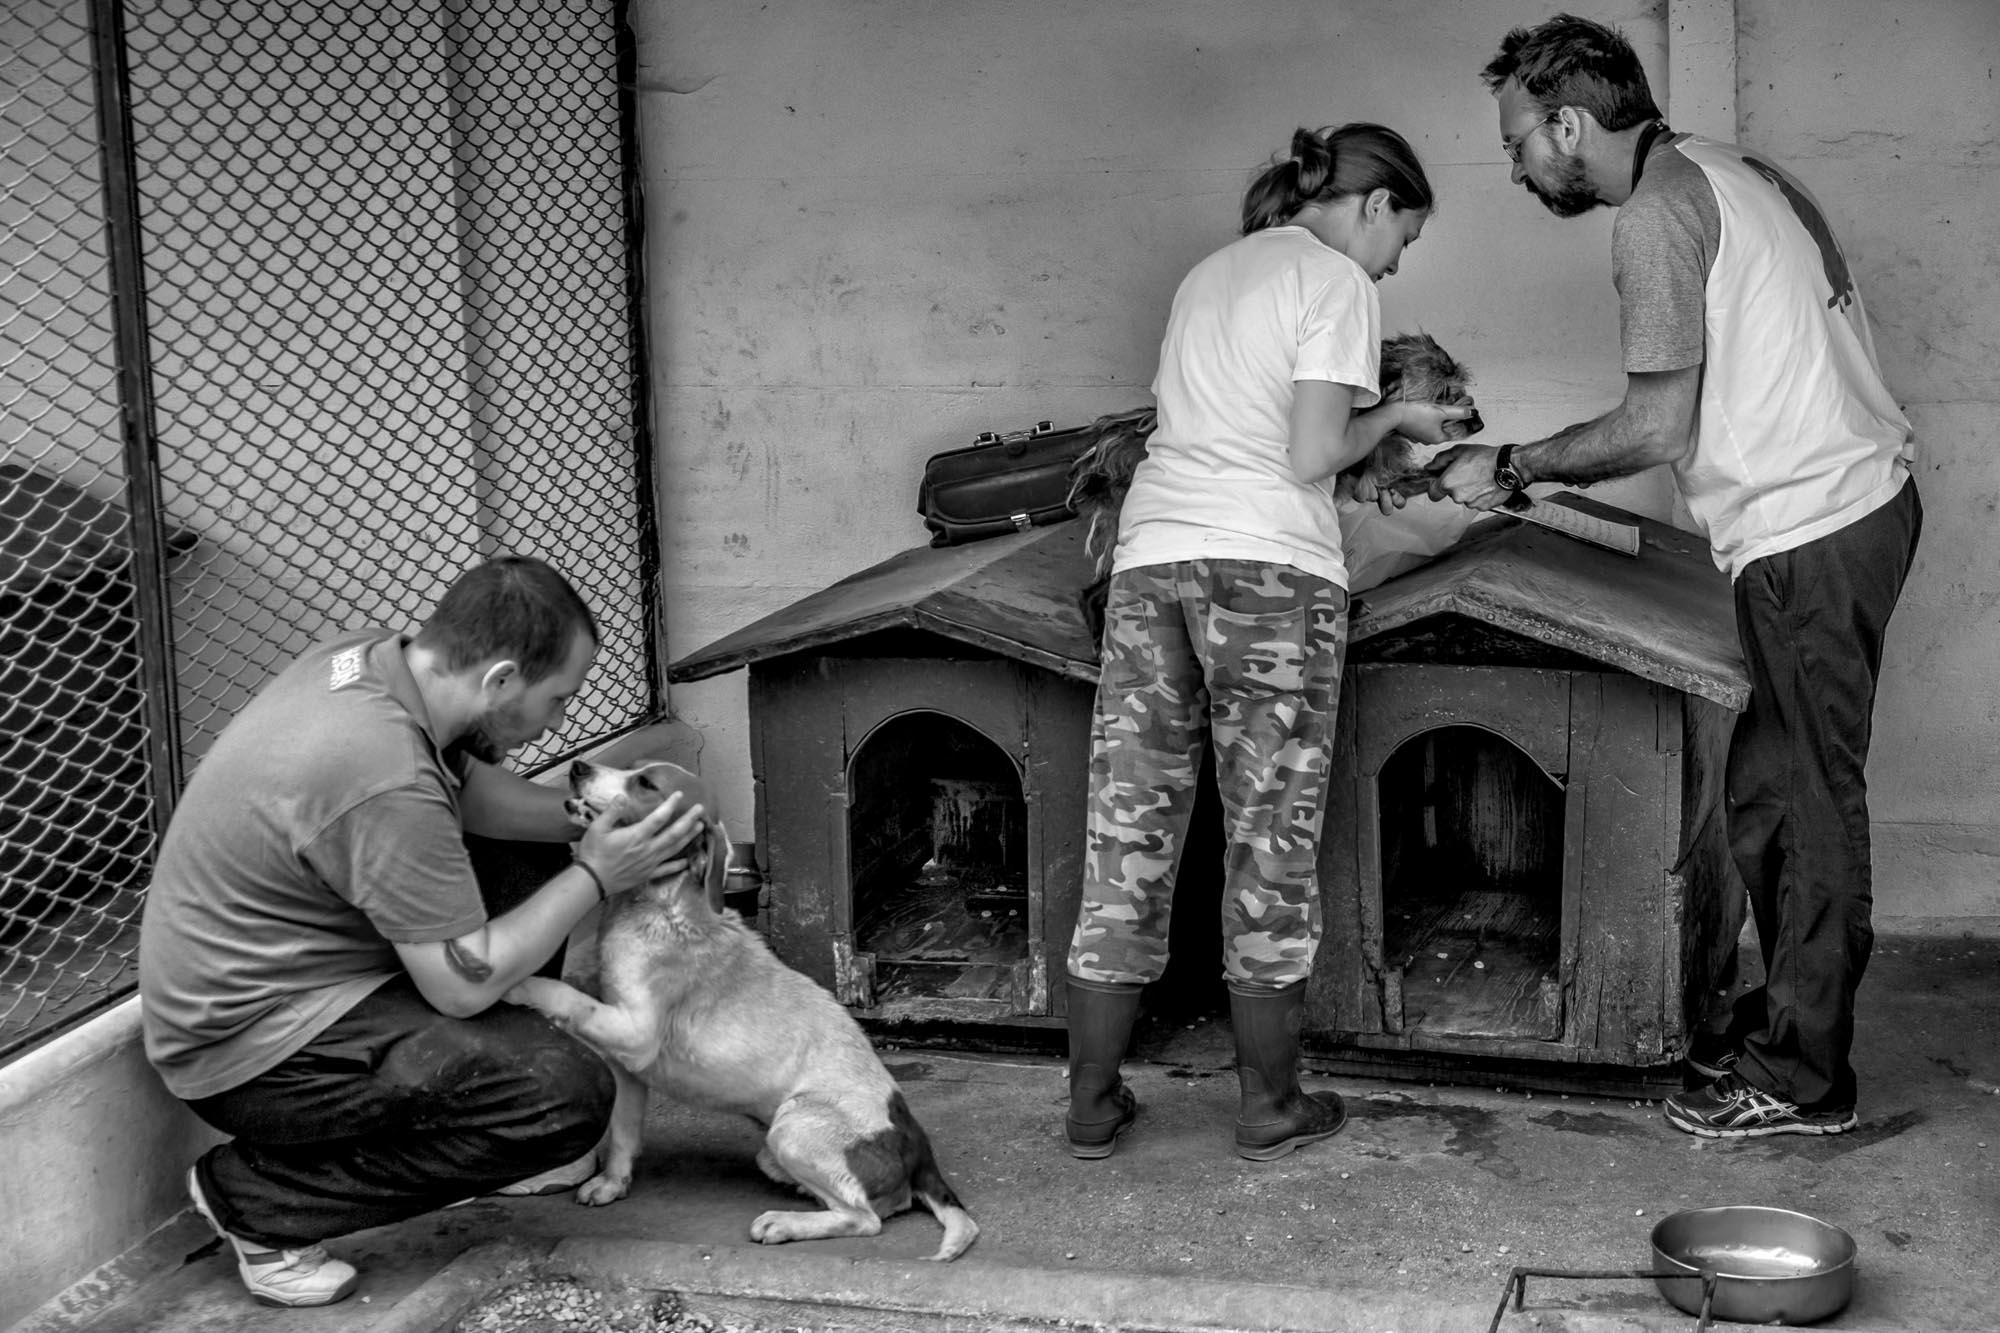 0441 Volontari canile 1 - Canile di Rubano Padova